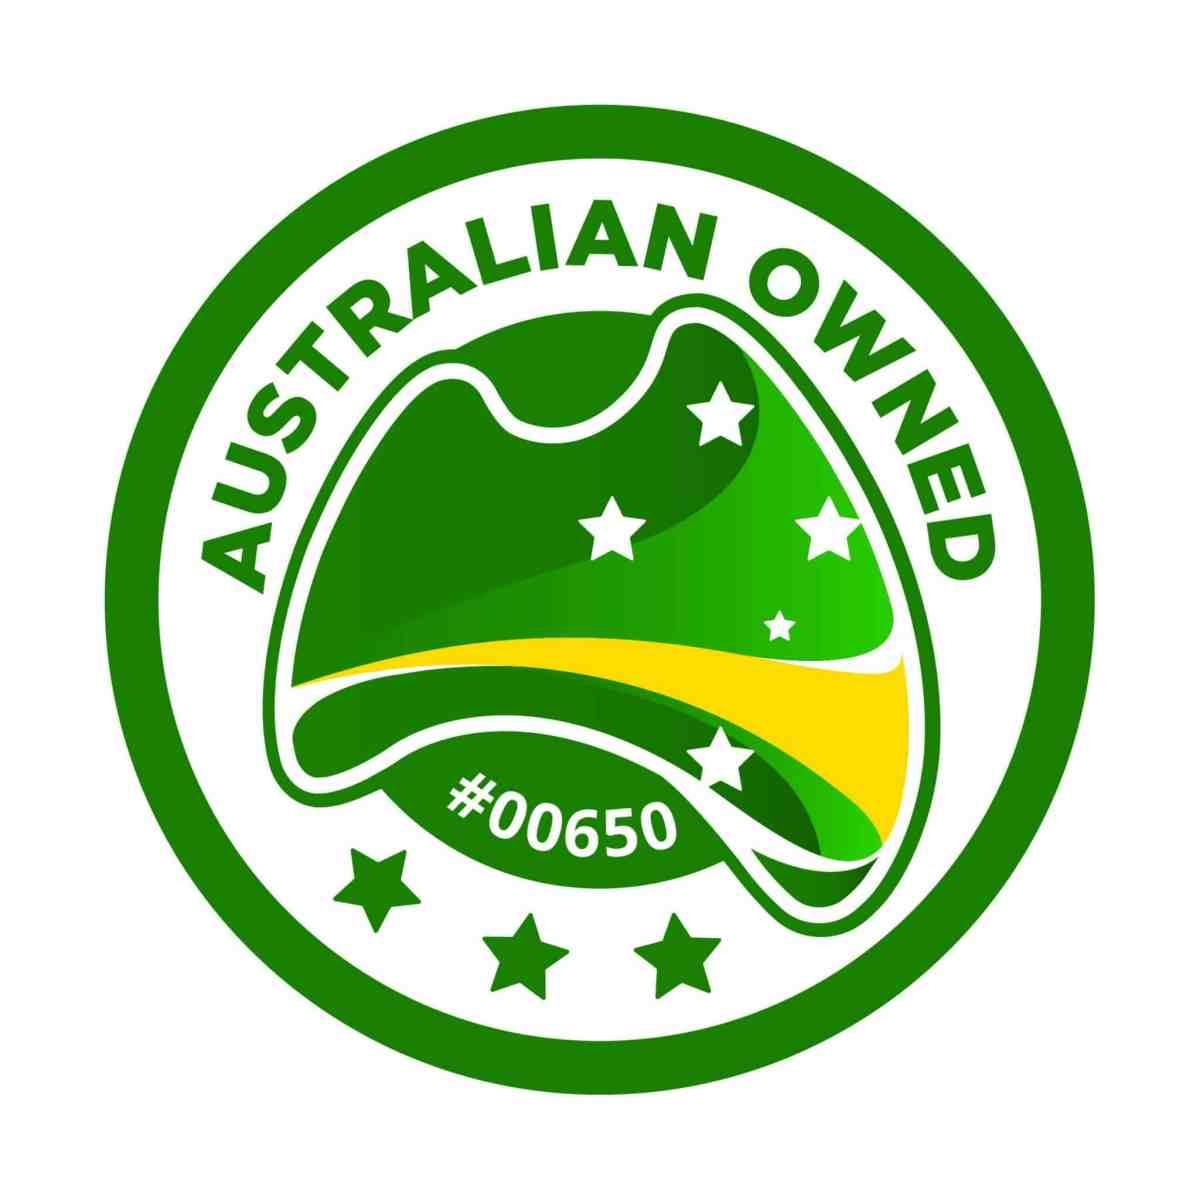 OZwool Sheepskin Australian made and owned Sheepskin